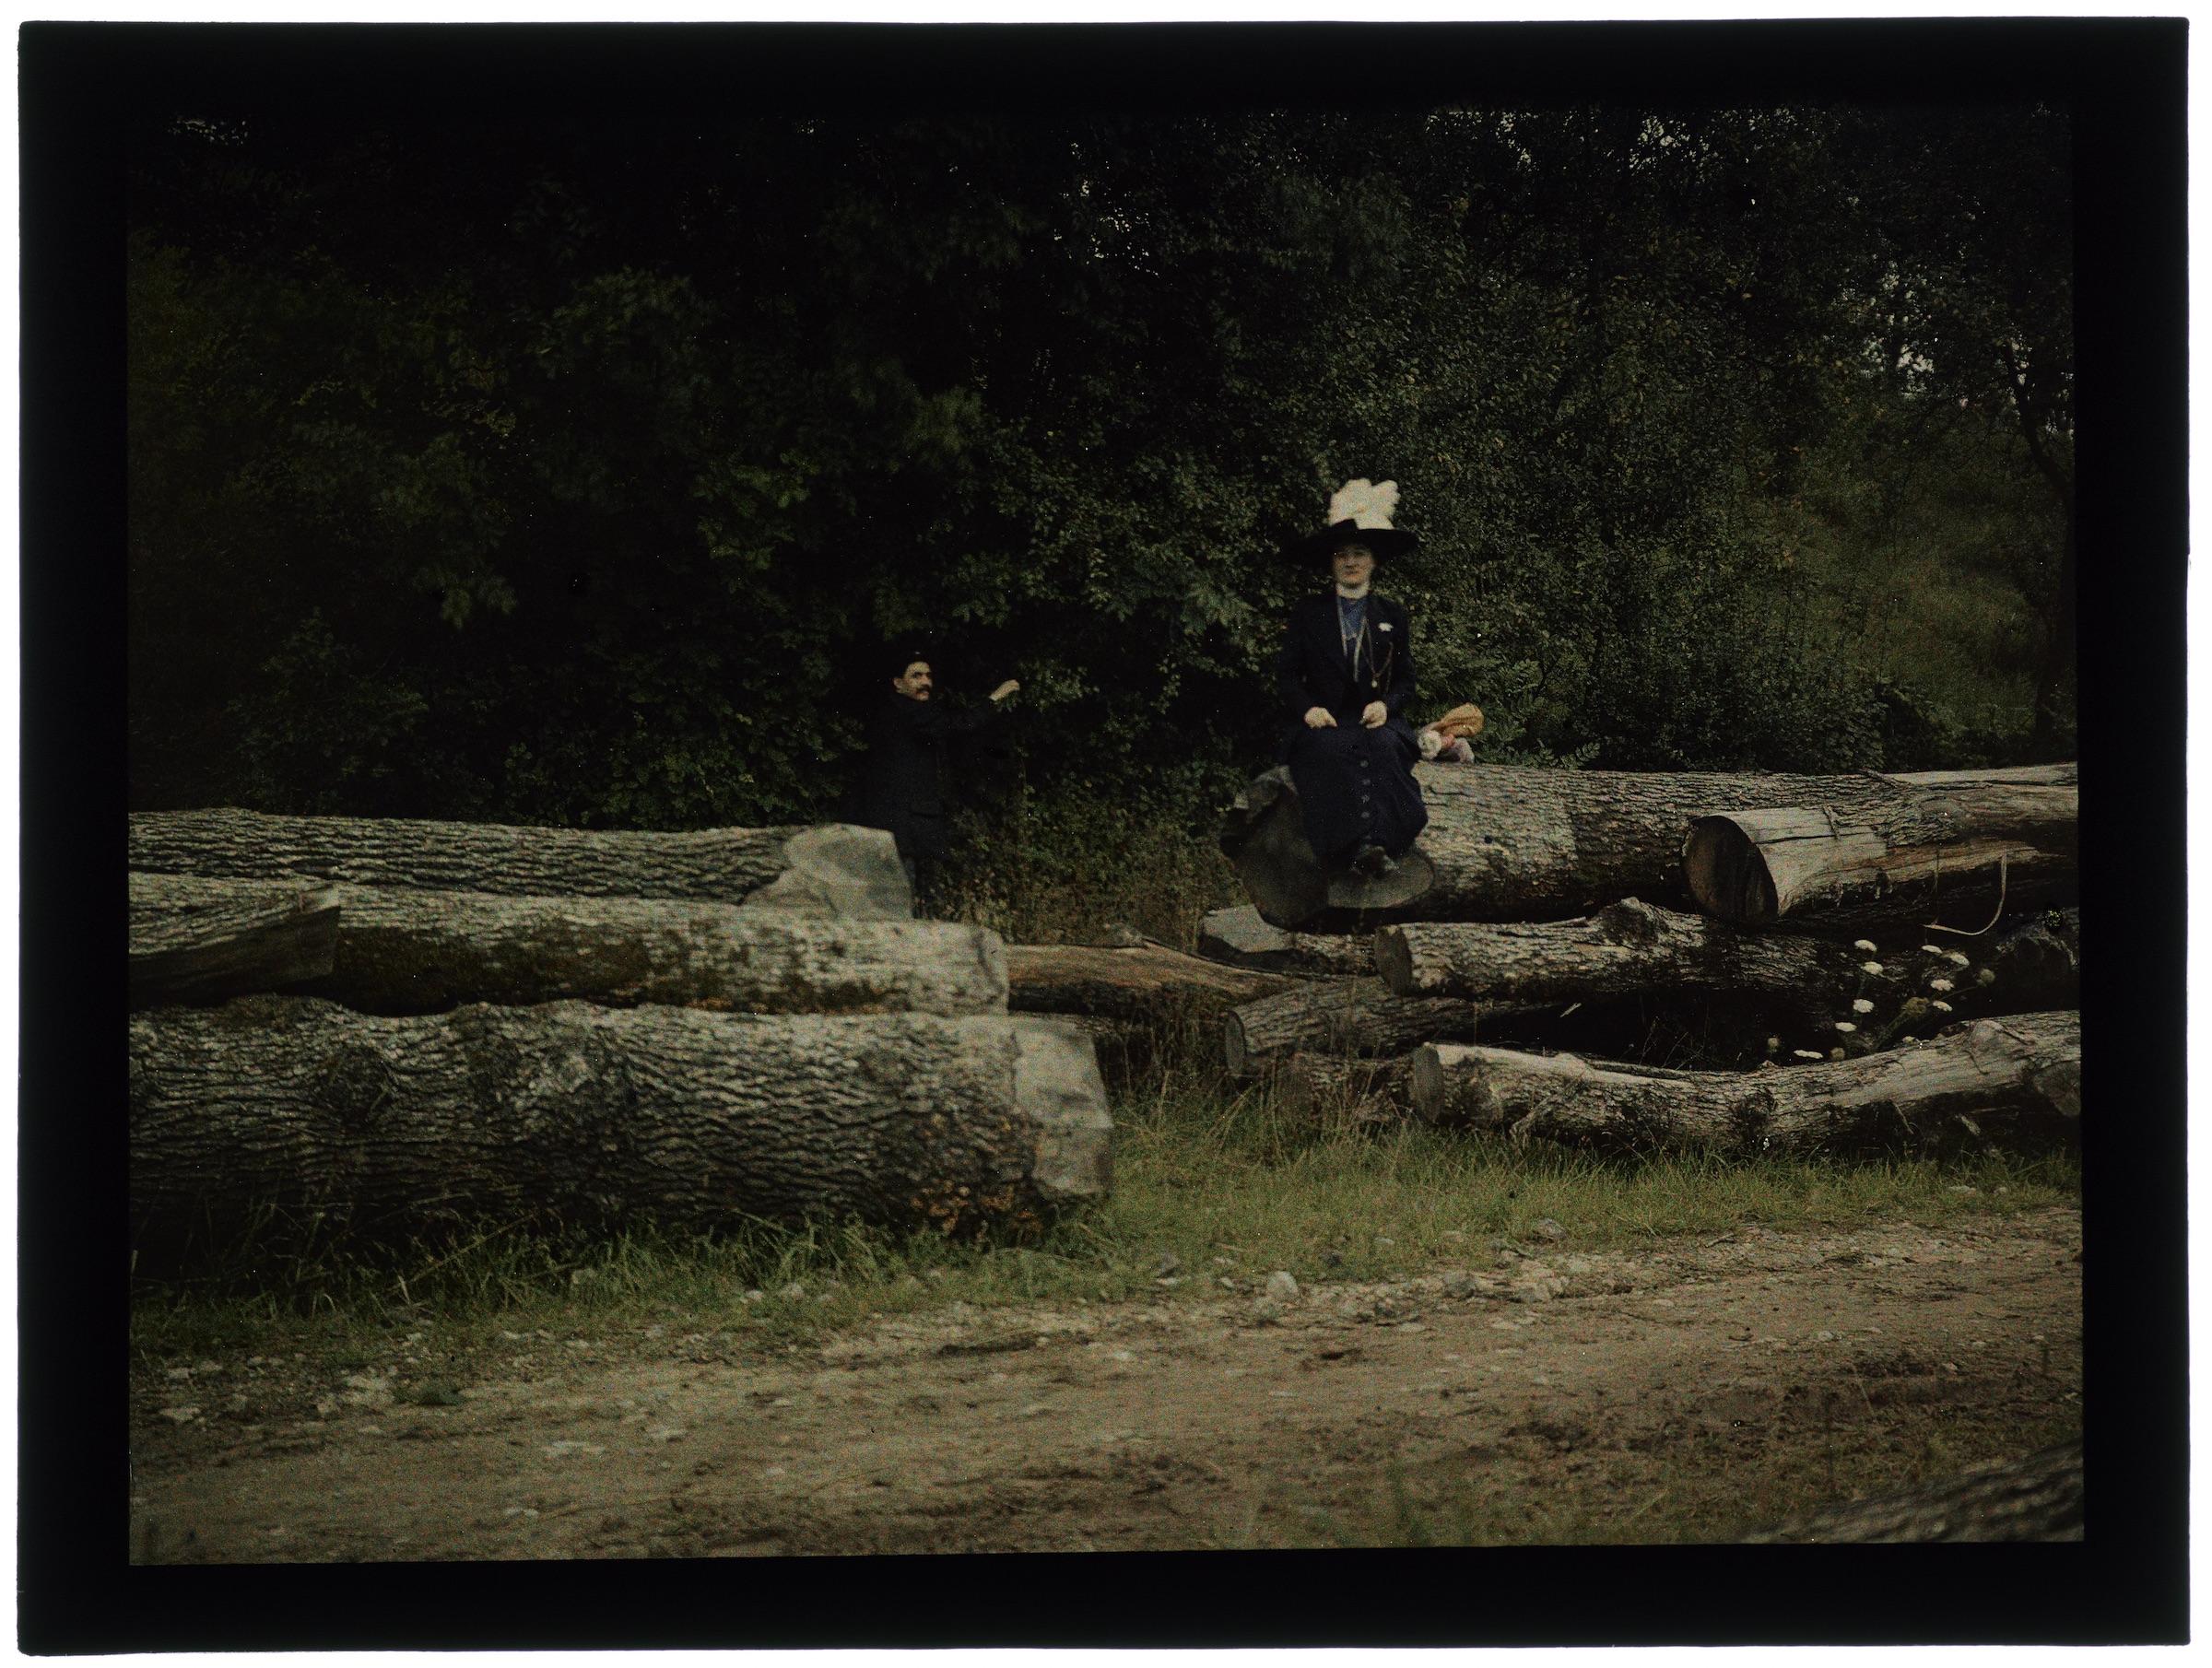 Femme dans le forêt